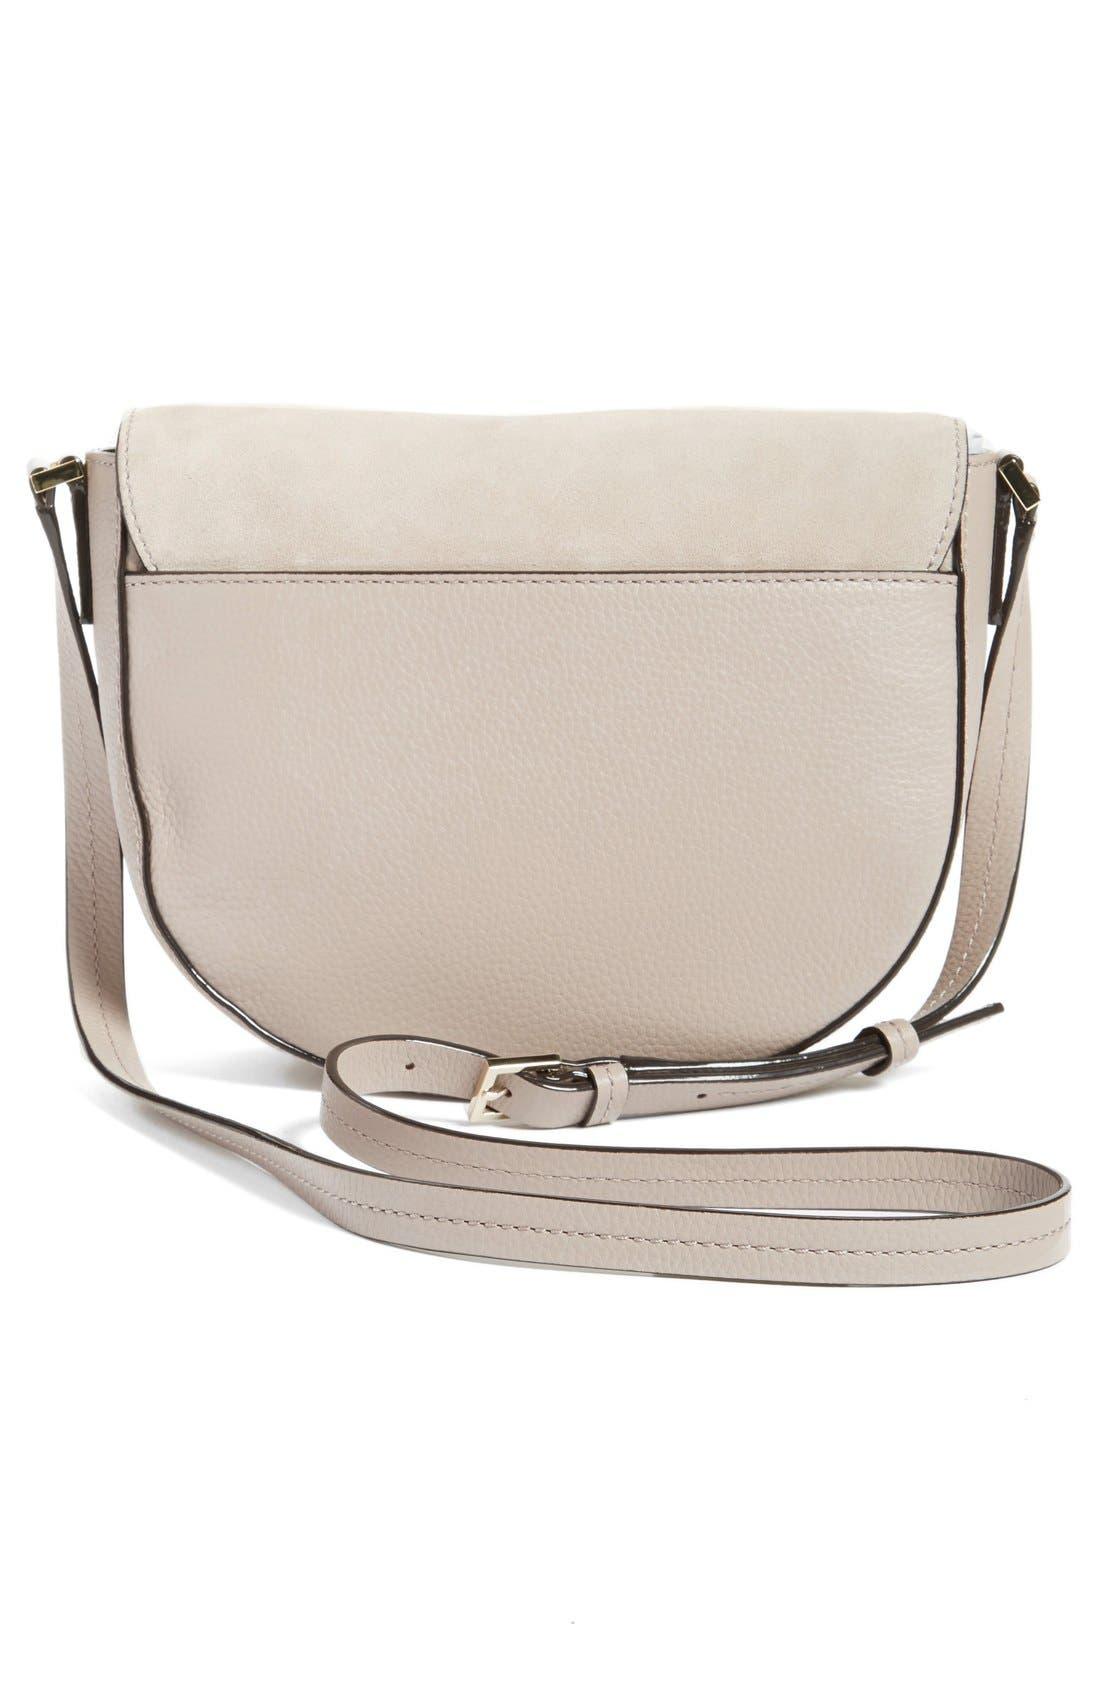 Alternate Image 3  - kate spade new york 'spencer court - lavinia' leather & suede crossbody bag